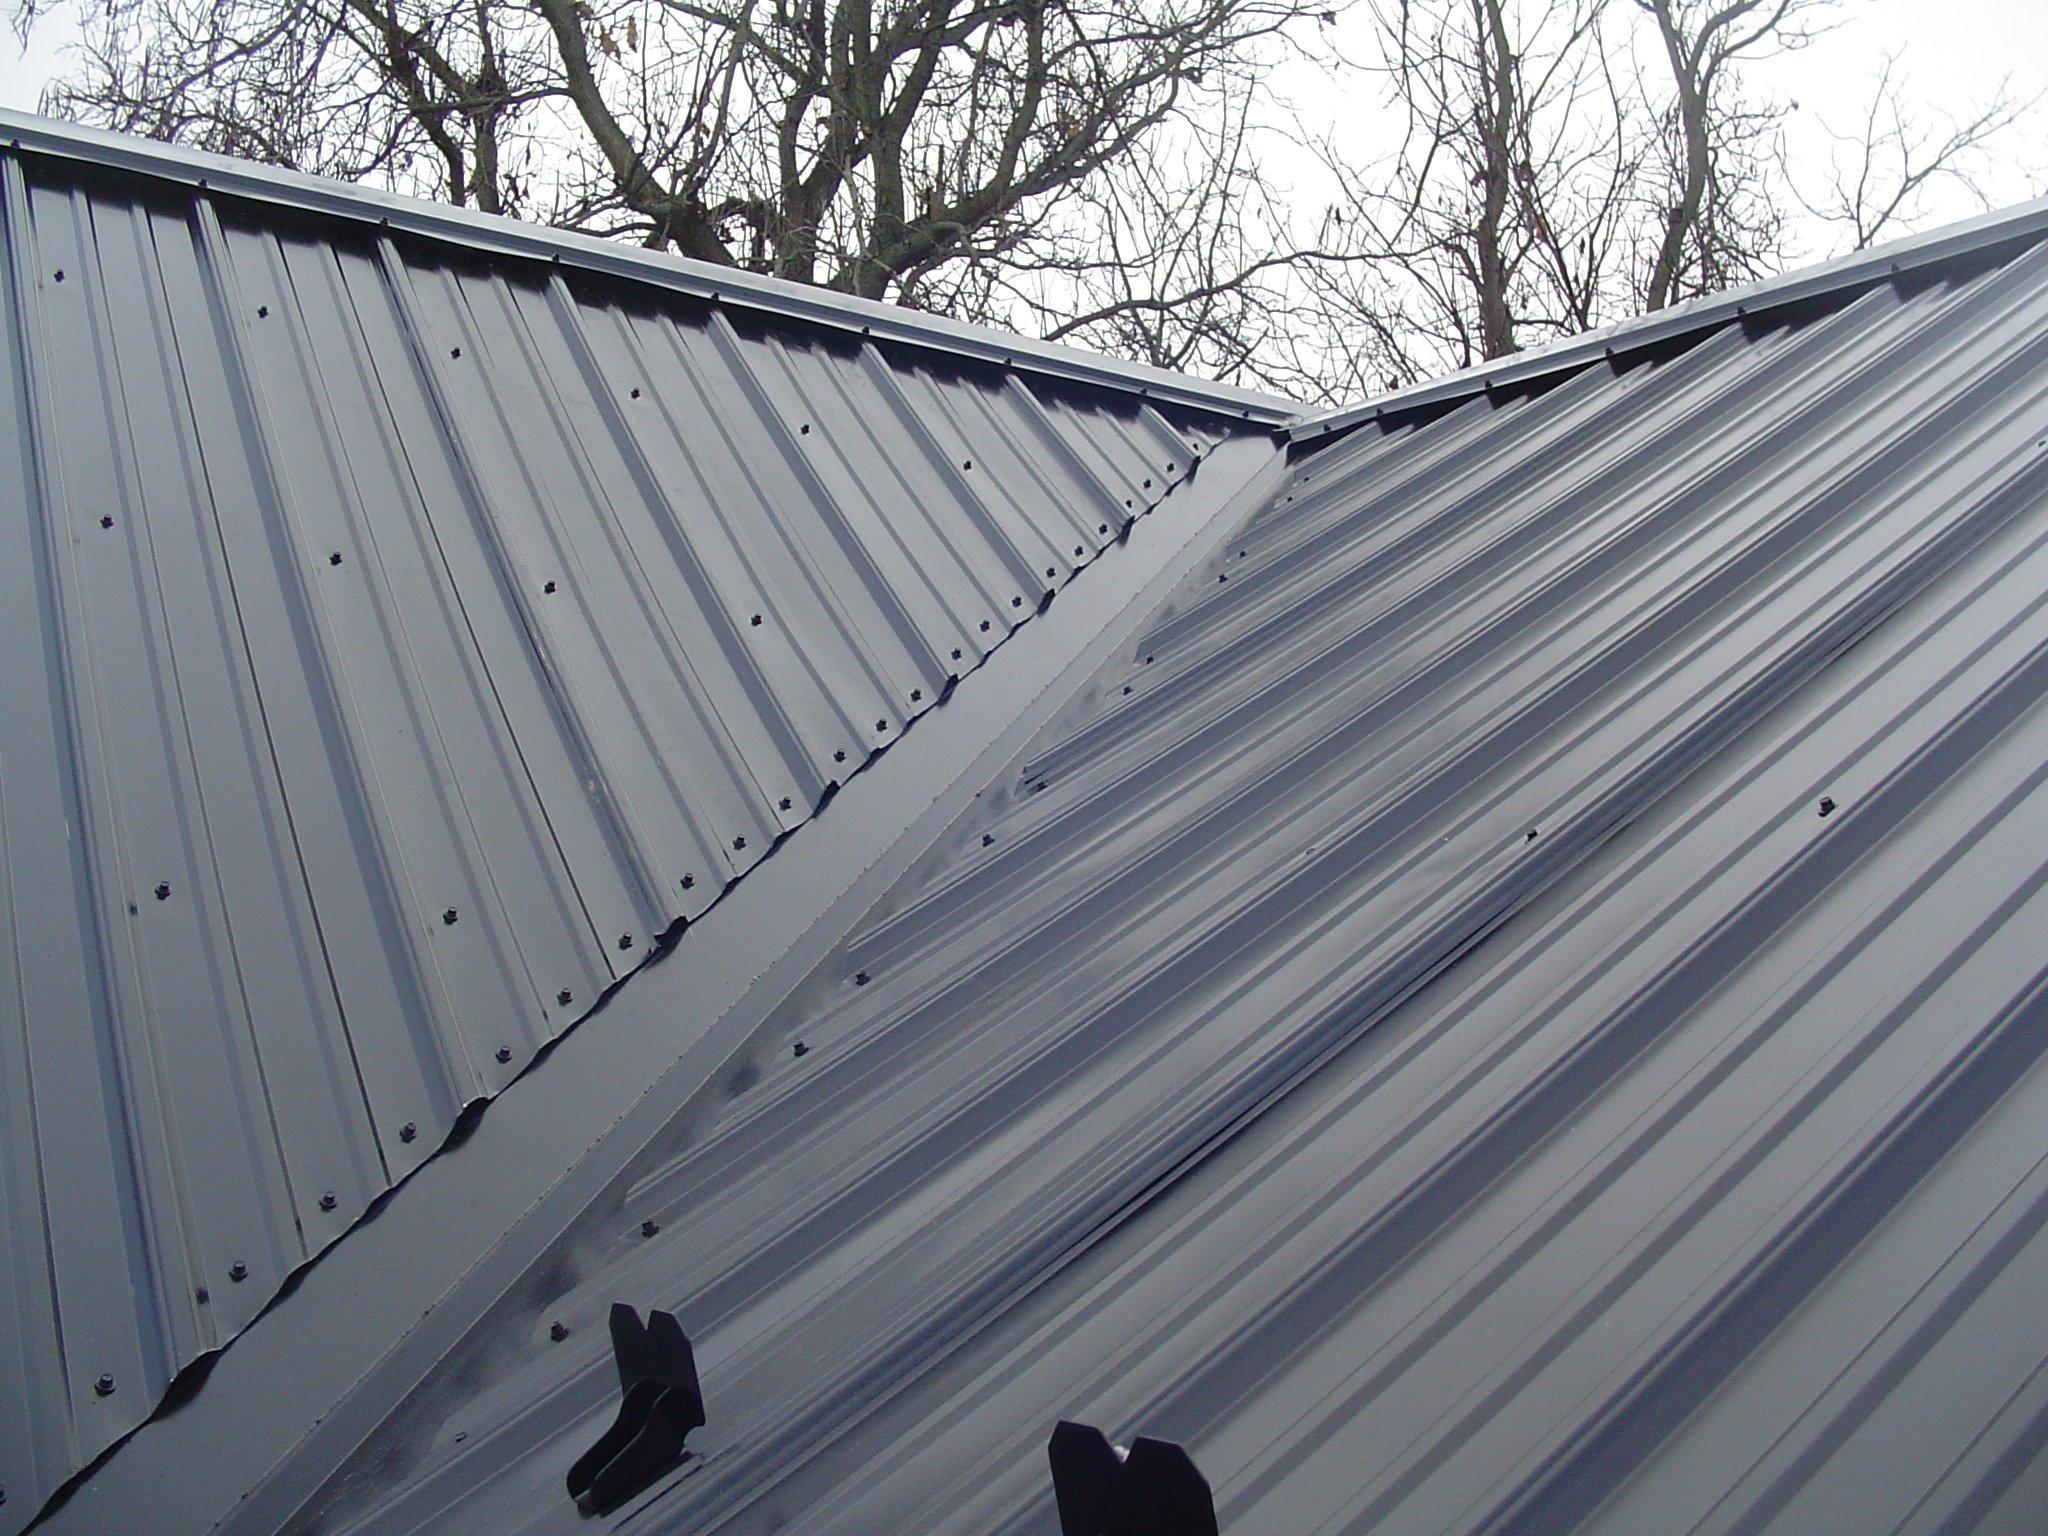 Roofing Installation for Buffalo NY House